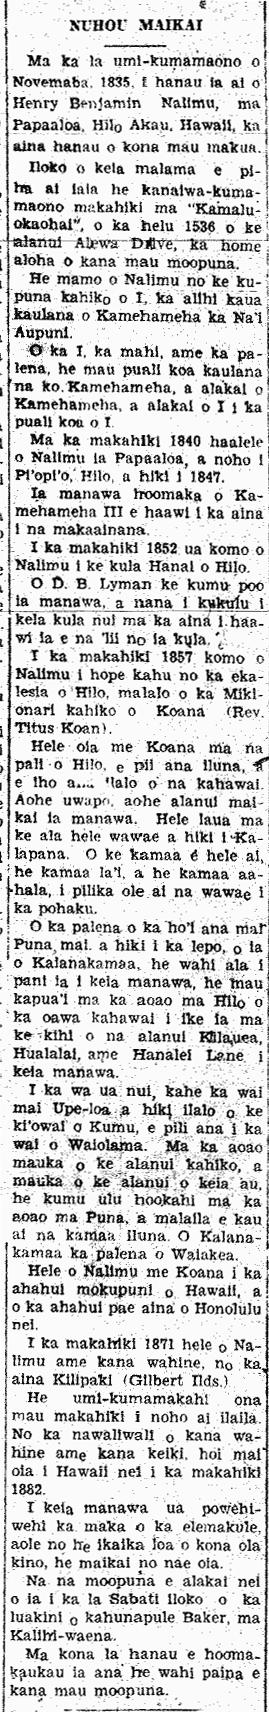 AlakaioHawaii_12_17_1931_4